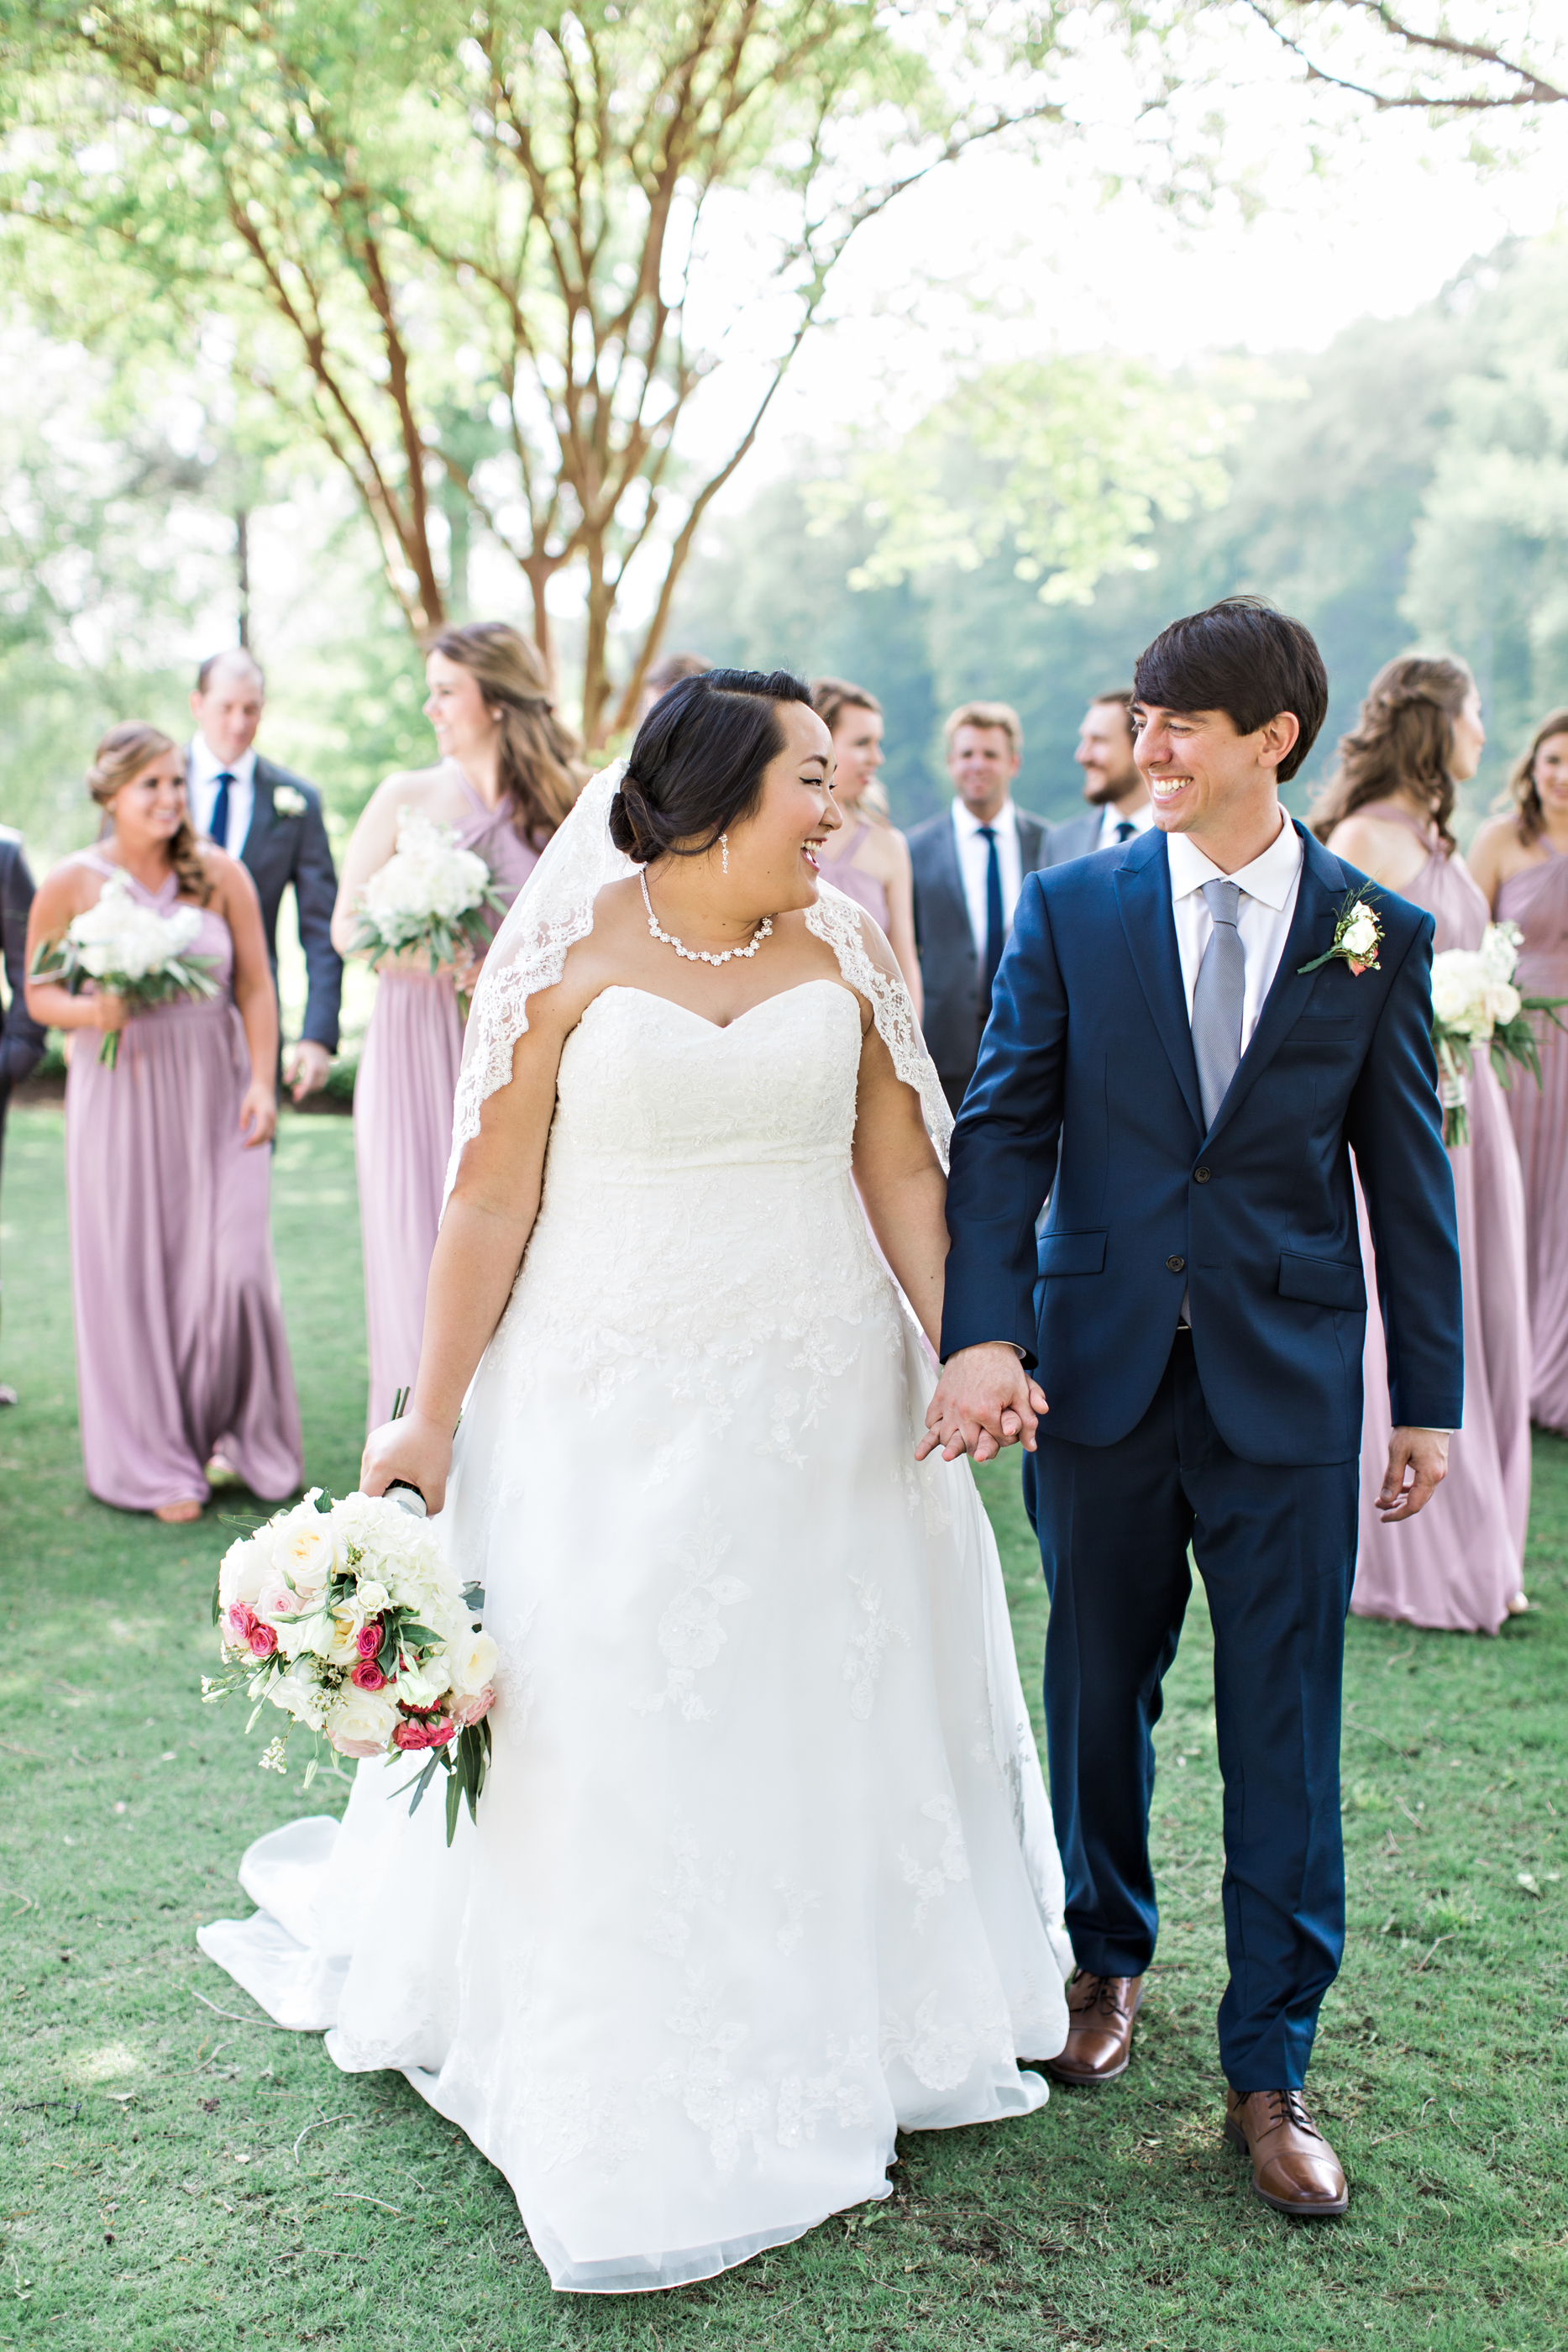 Ni ck-Drollette-Photography-Auburn-Alabama-Weddings-Sylvia-Kevin-123.jpg